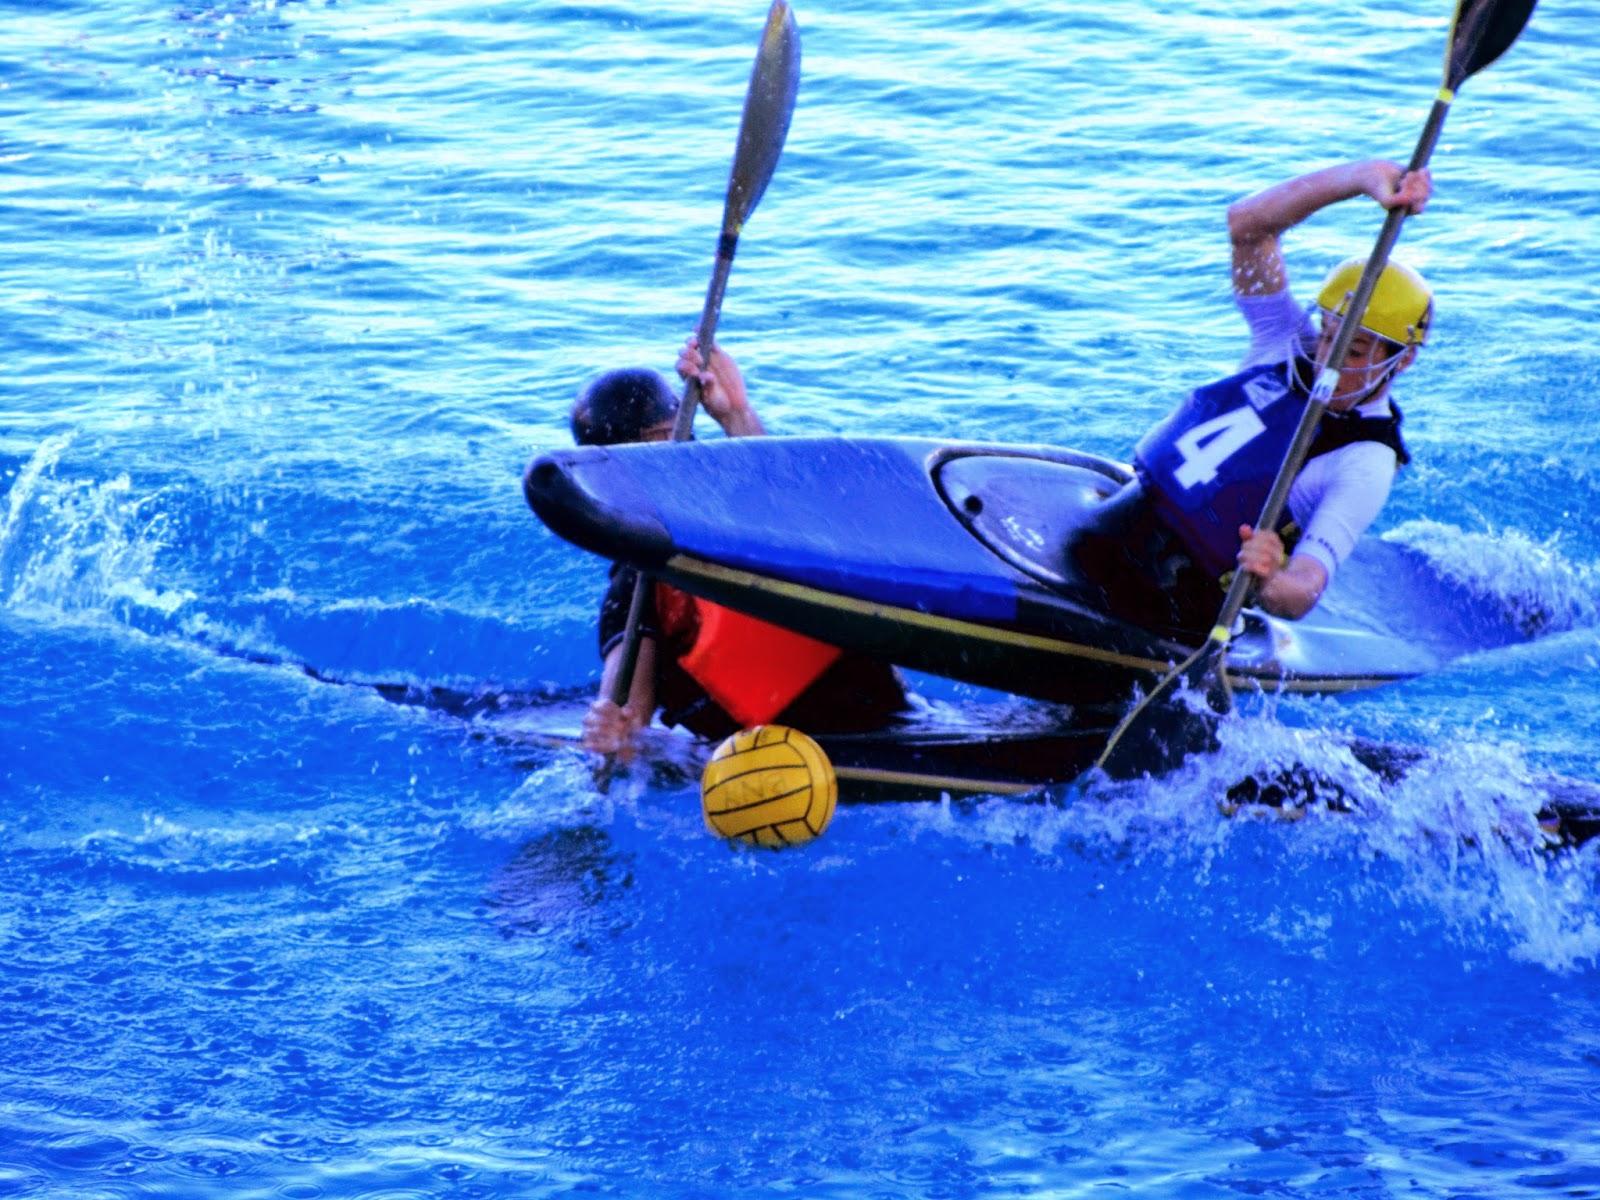 Club pirag isme silla kayak polo ii torneo de la1 for Sillas para kayak